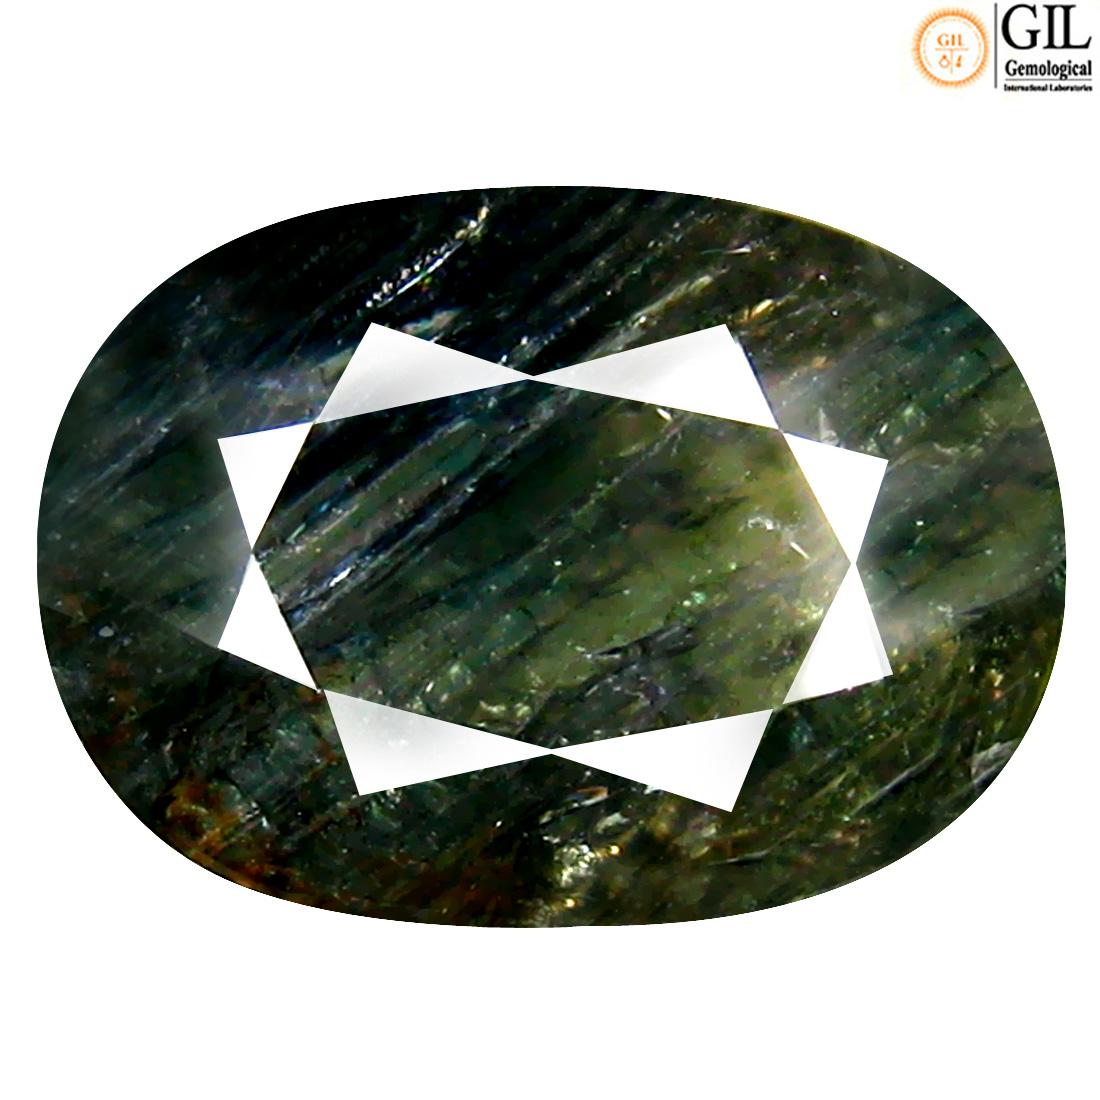 16.84 ct GIL Certified Mesmerizing Oval Cut (18 x 13 mm) Un-Heated Green Sapphire Loose Stone